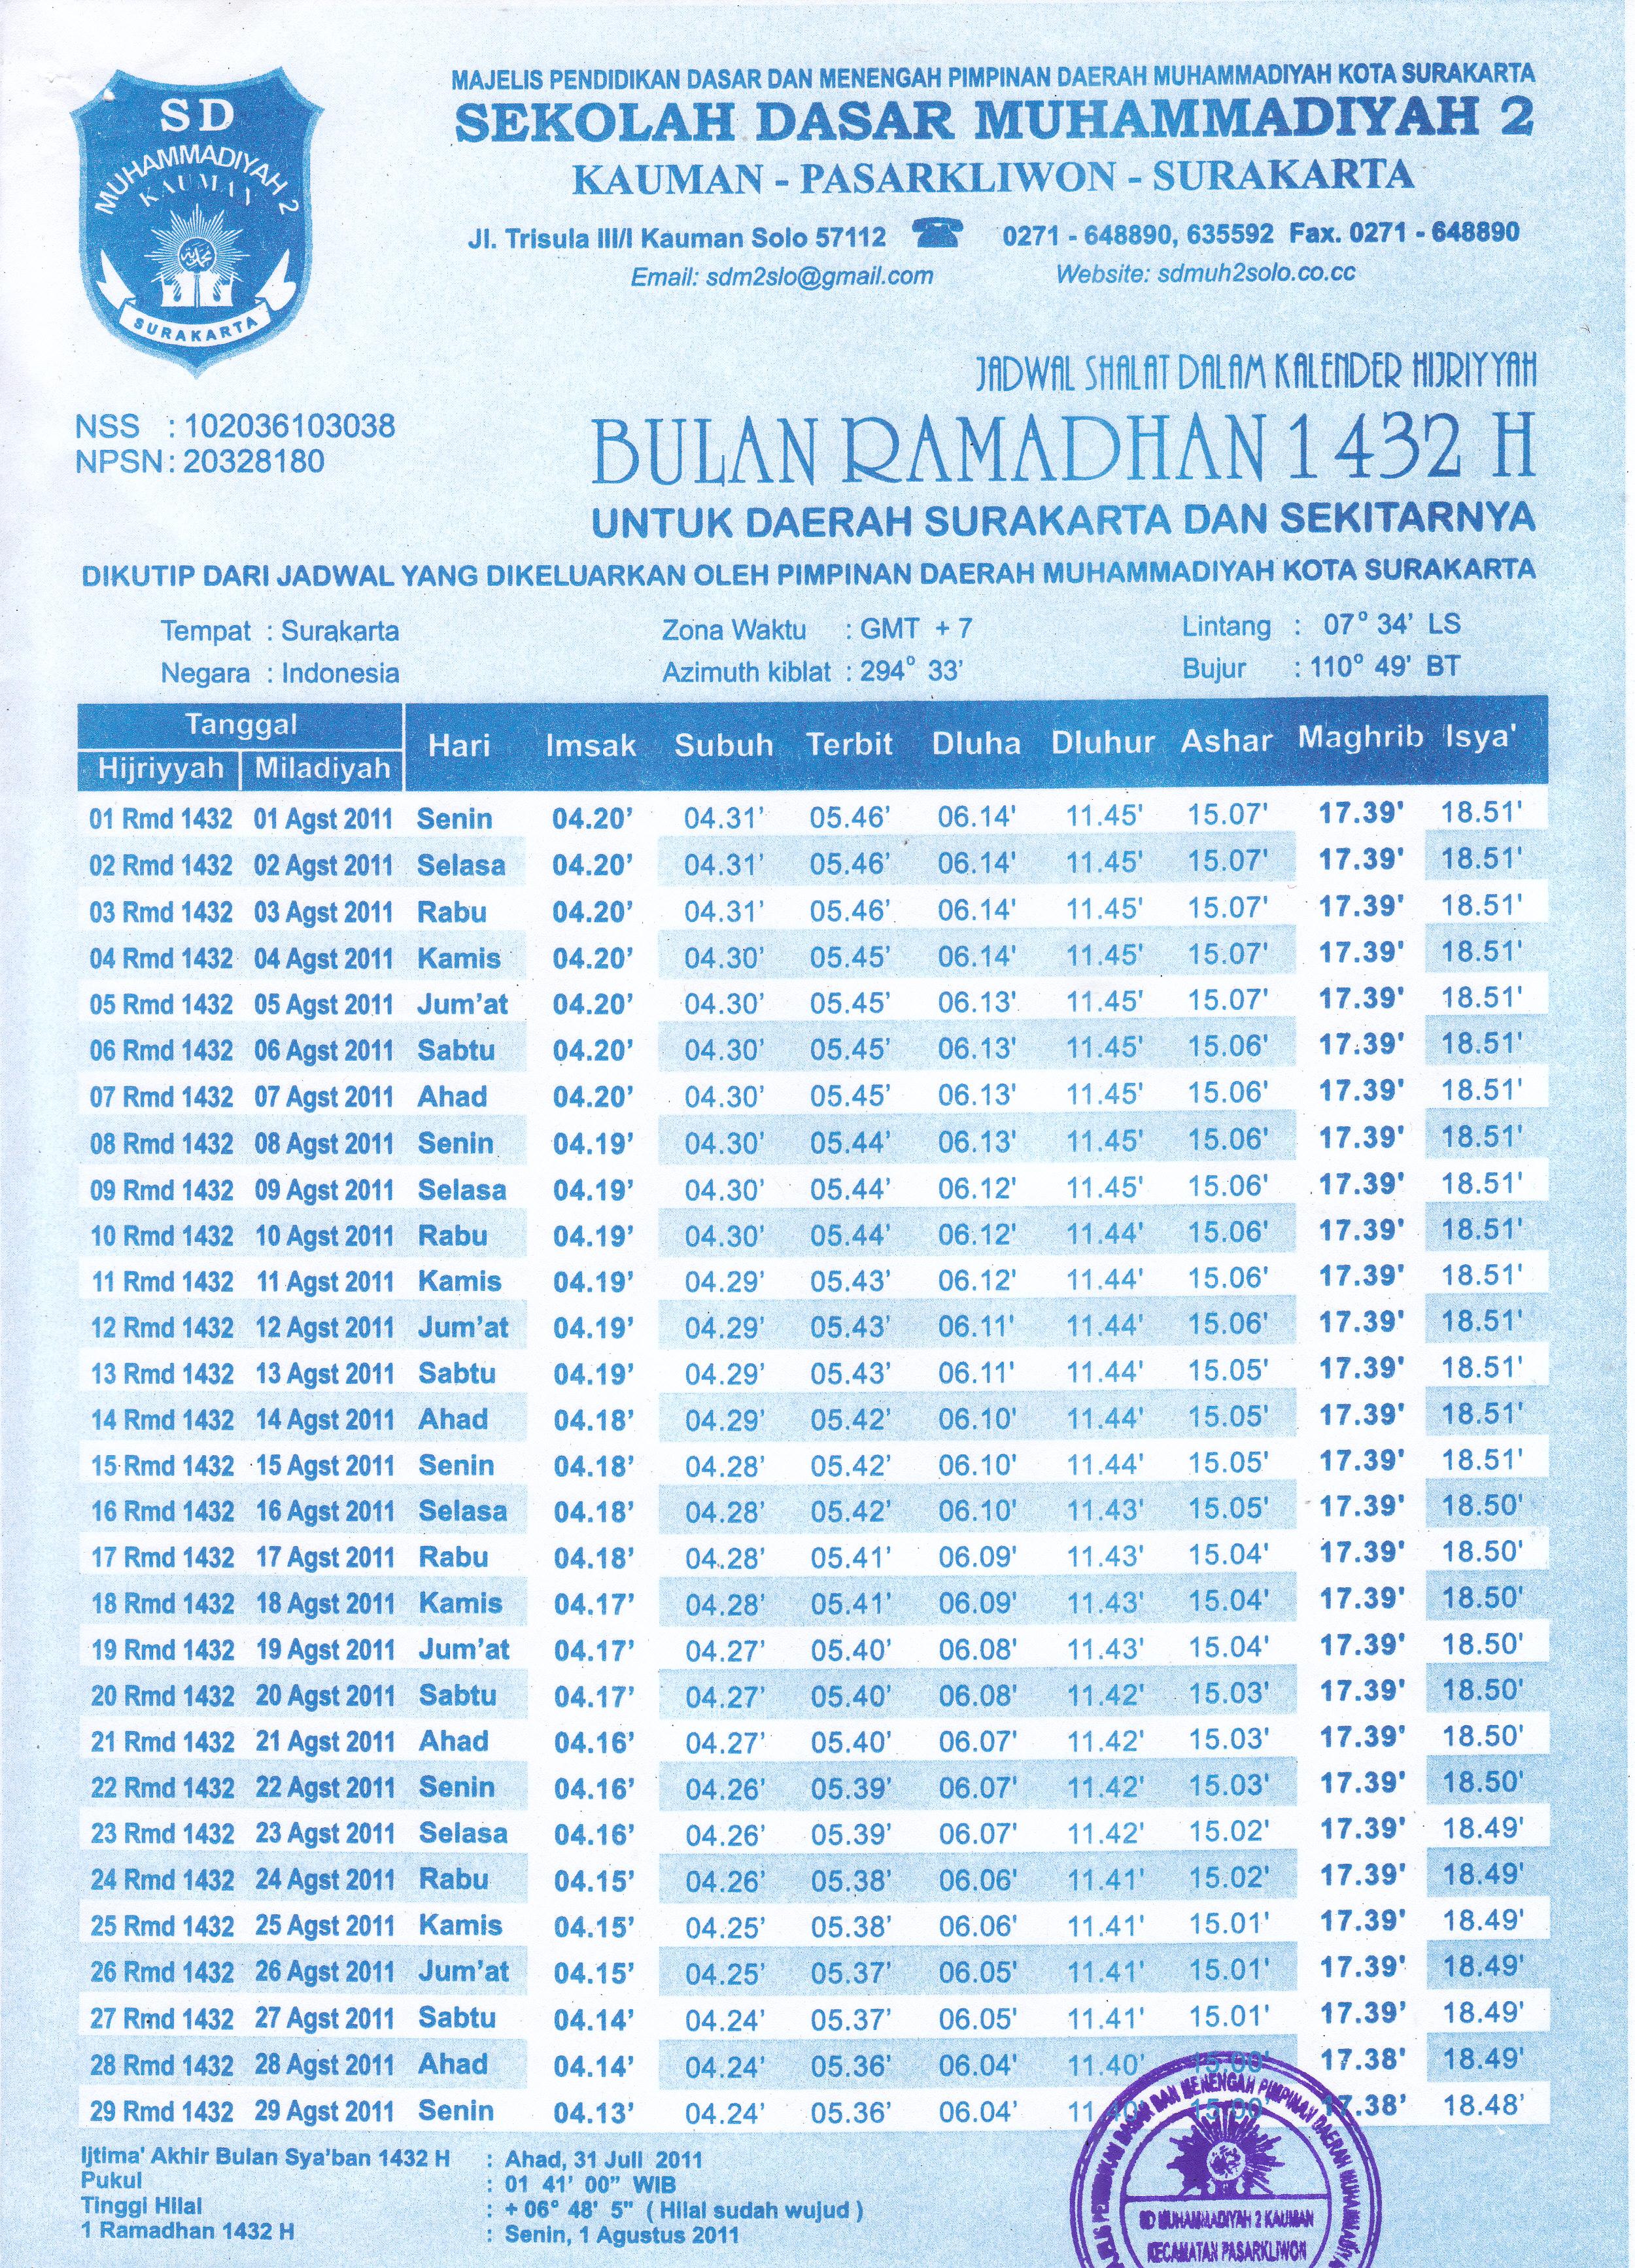 Disimpan dalam Berita , Jadwal Dikaitkatakan dengan jadwal imsakiyah .